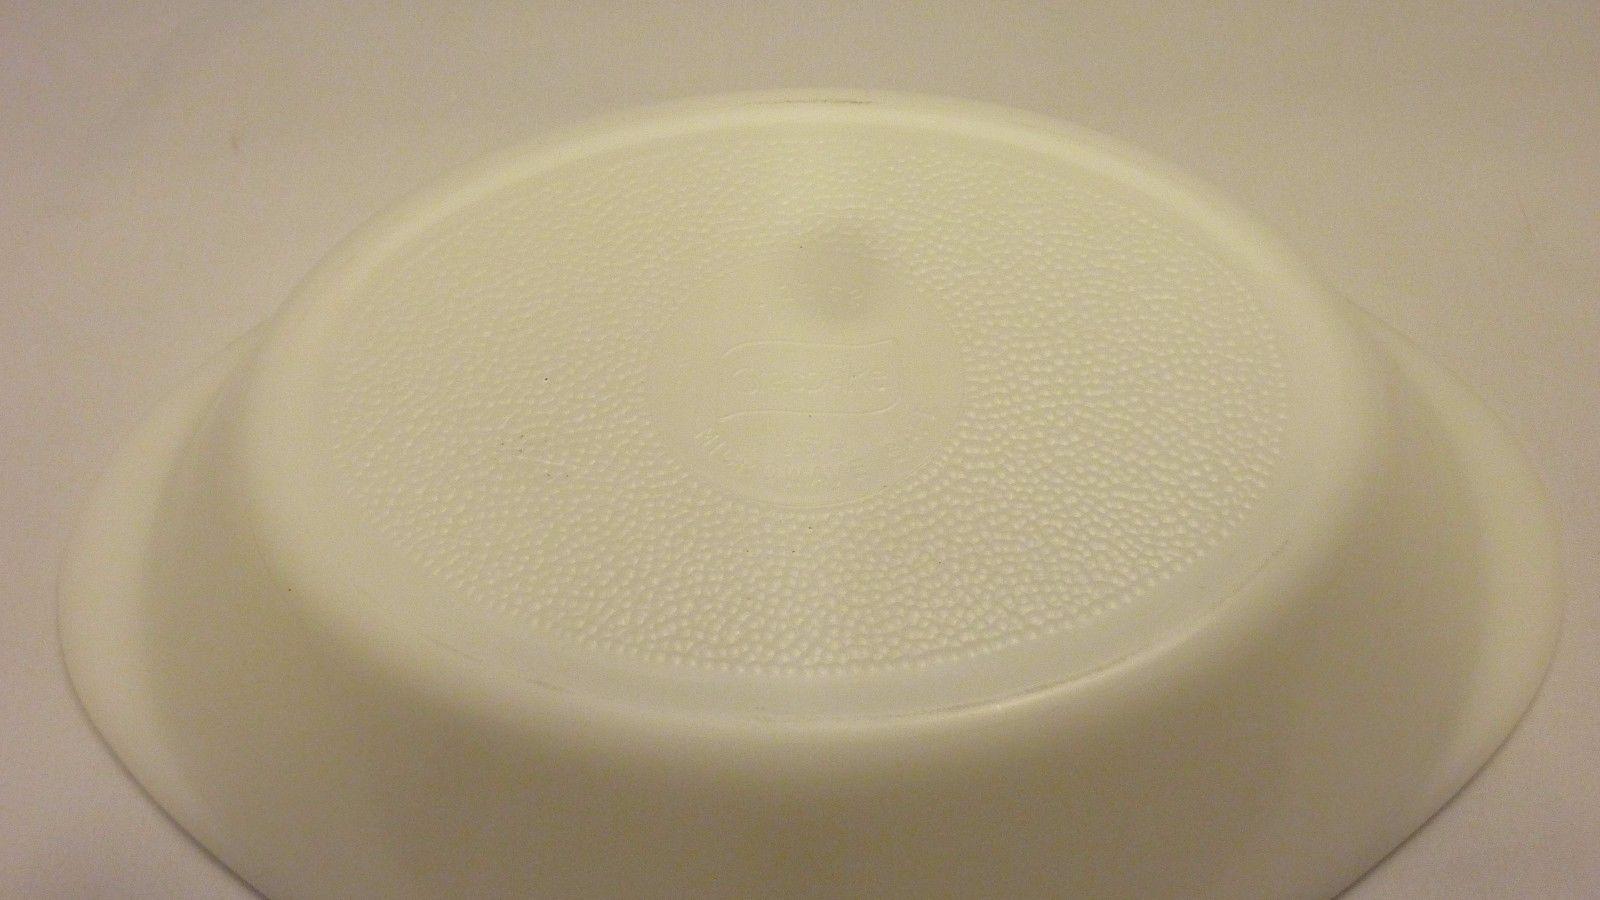 Vintage Made in USA Glasbake J2352 Milk White with Divider